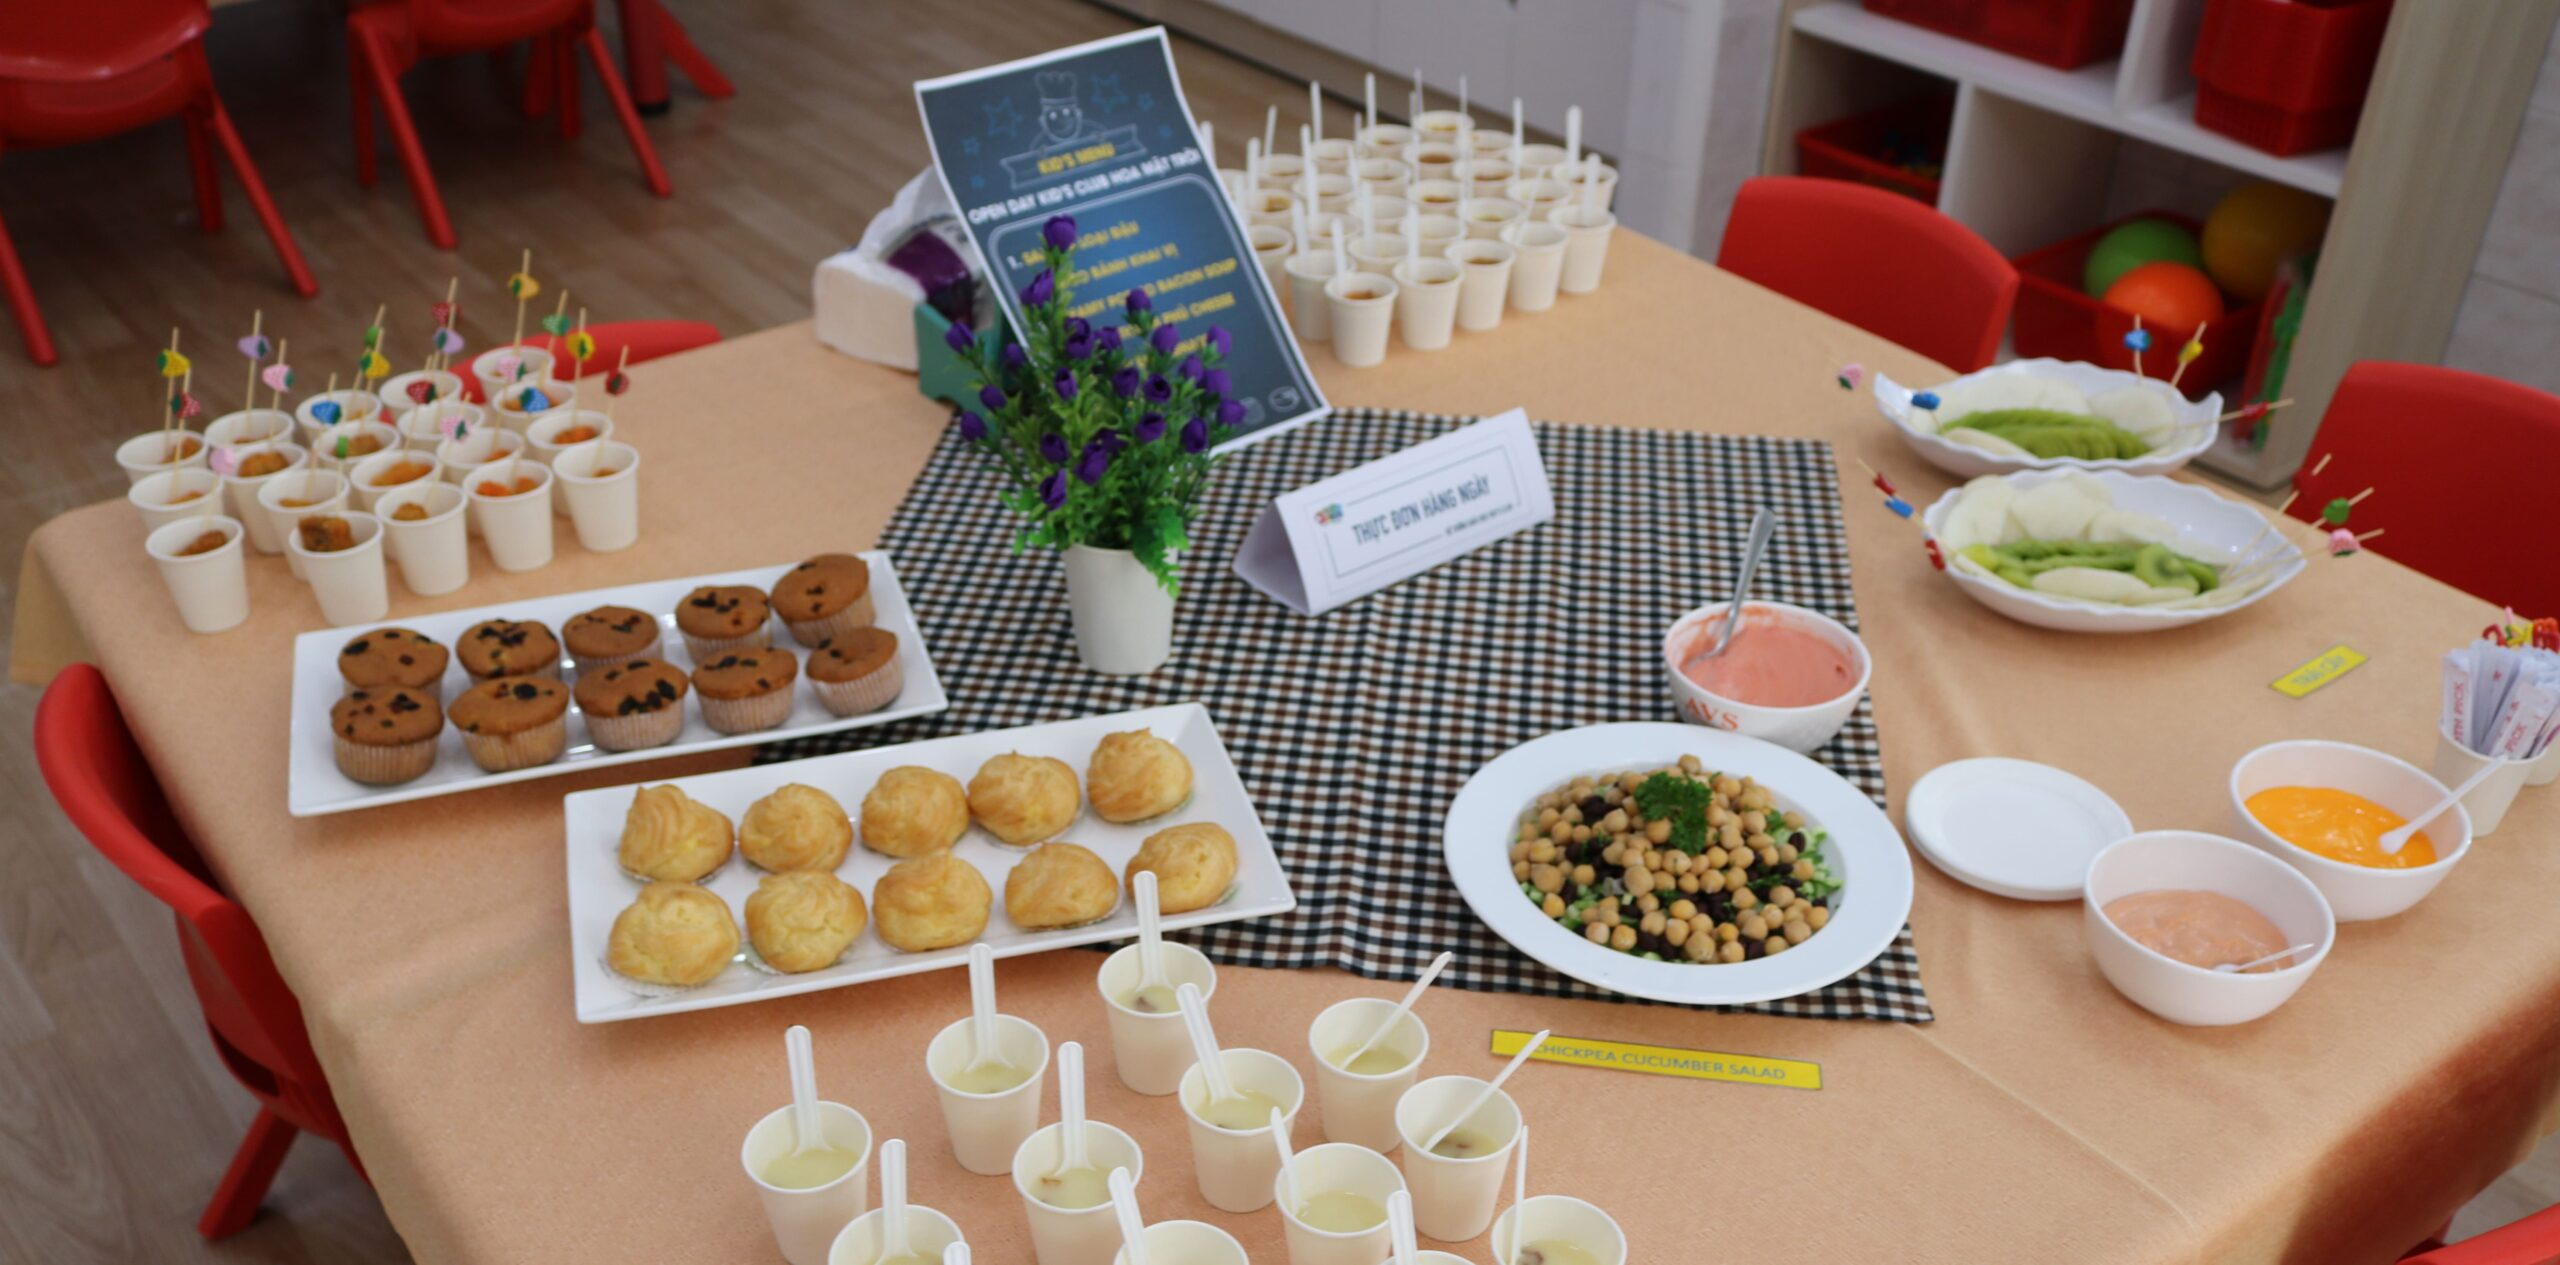 FoodClub – Suất ăn dinh dưỡng